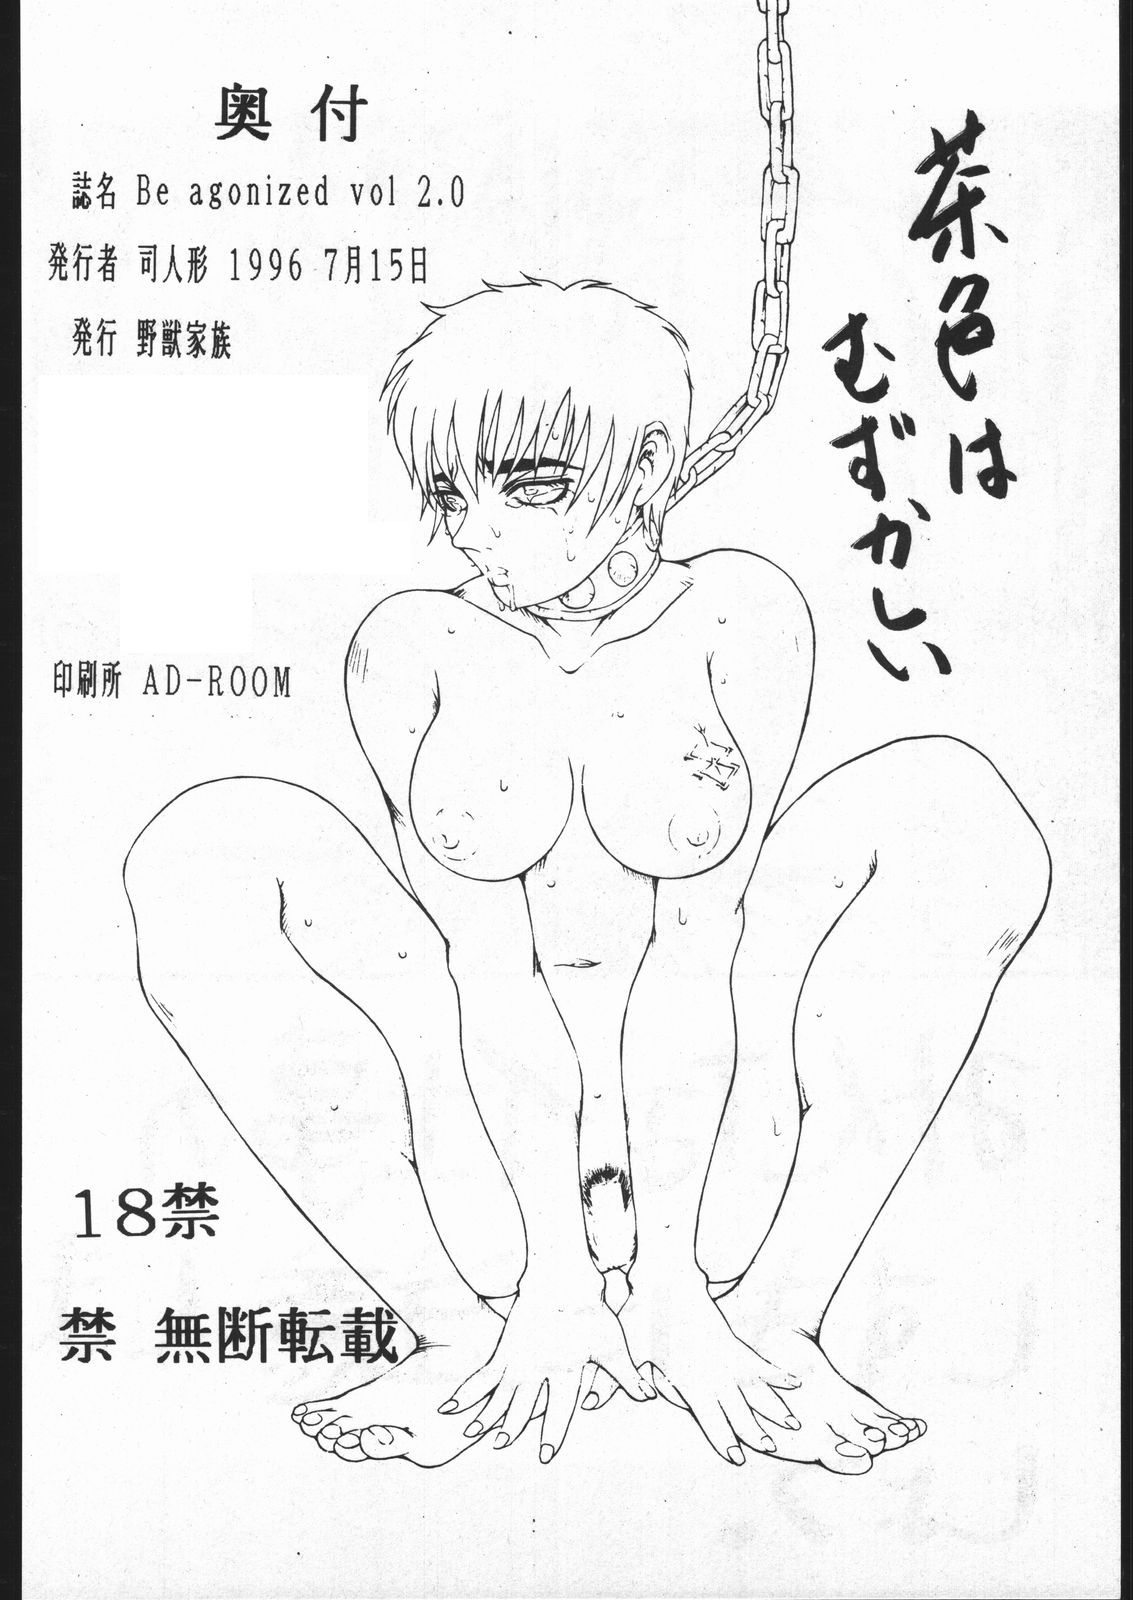 casca judeau berserk: & Bestiality salon of a secret